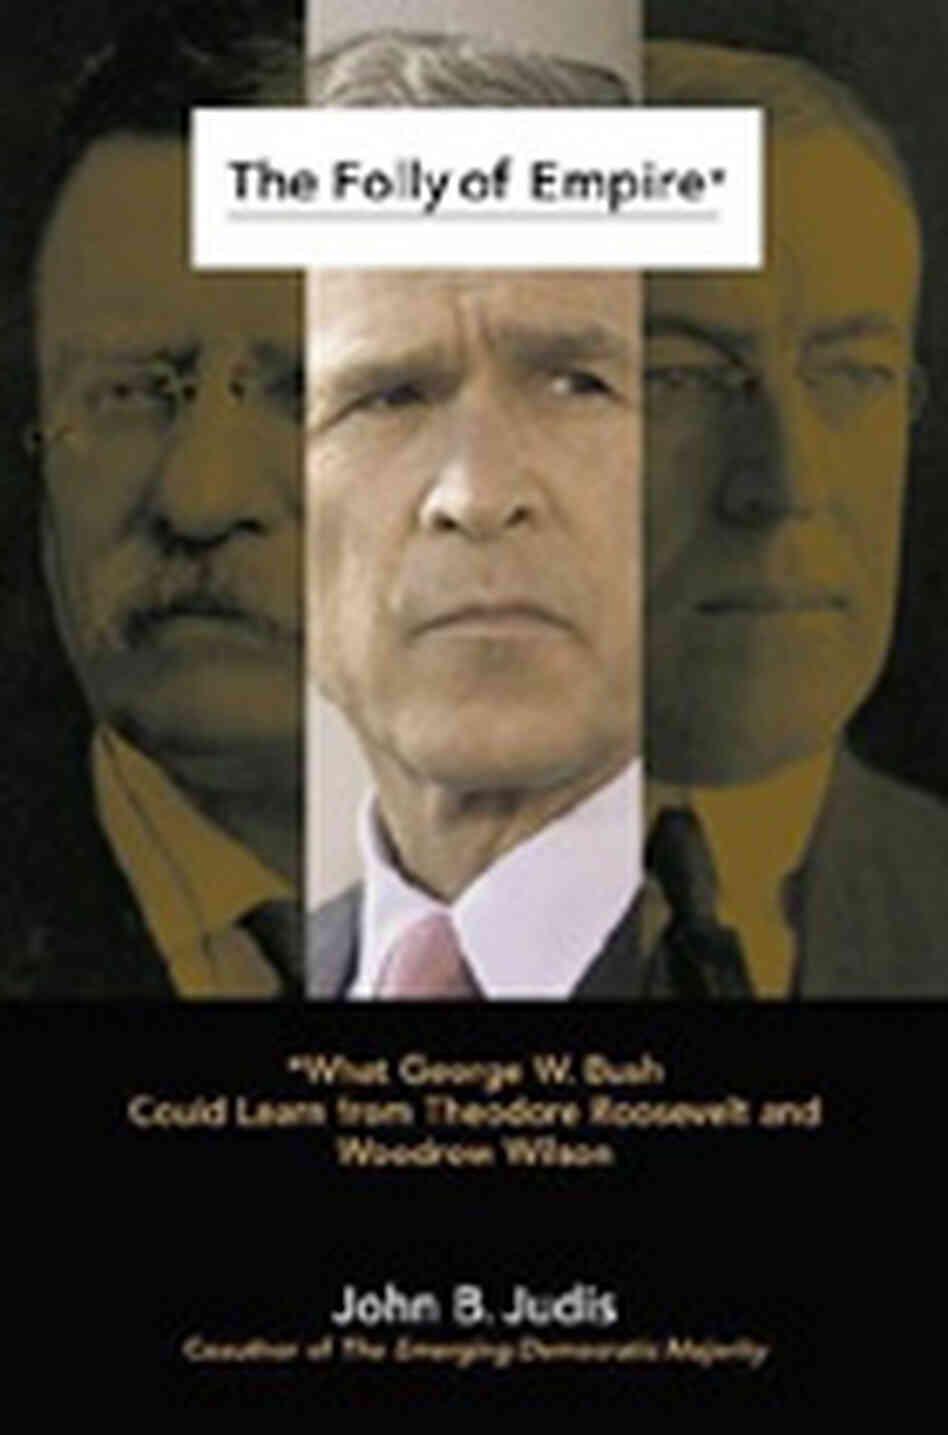 9780310447511 - Biblical Authority: A Critique of the Rogers/McKim Proposal by John D Woodbridge